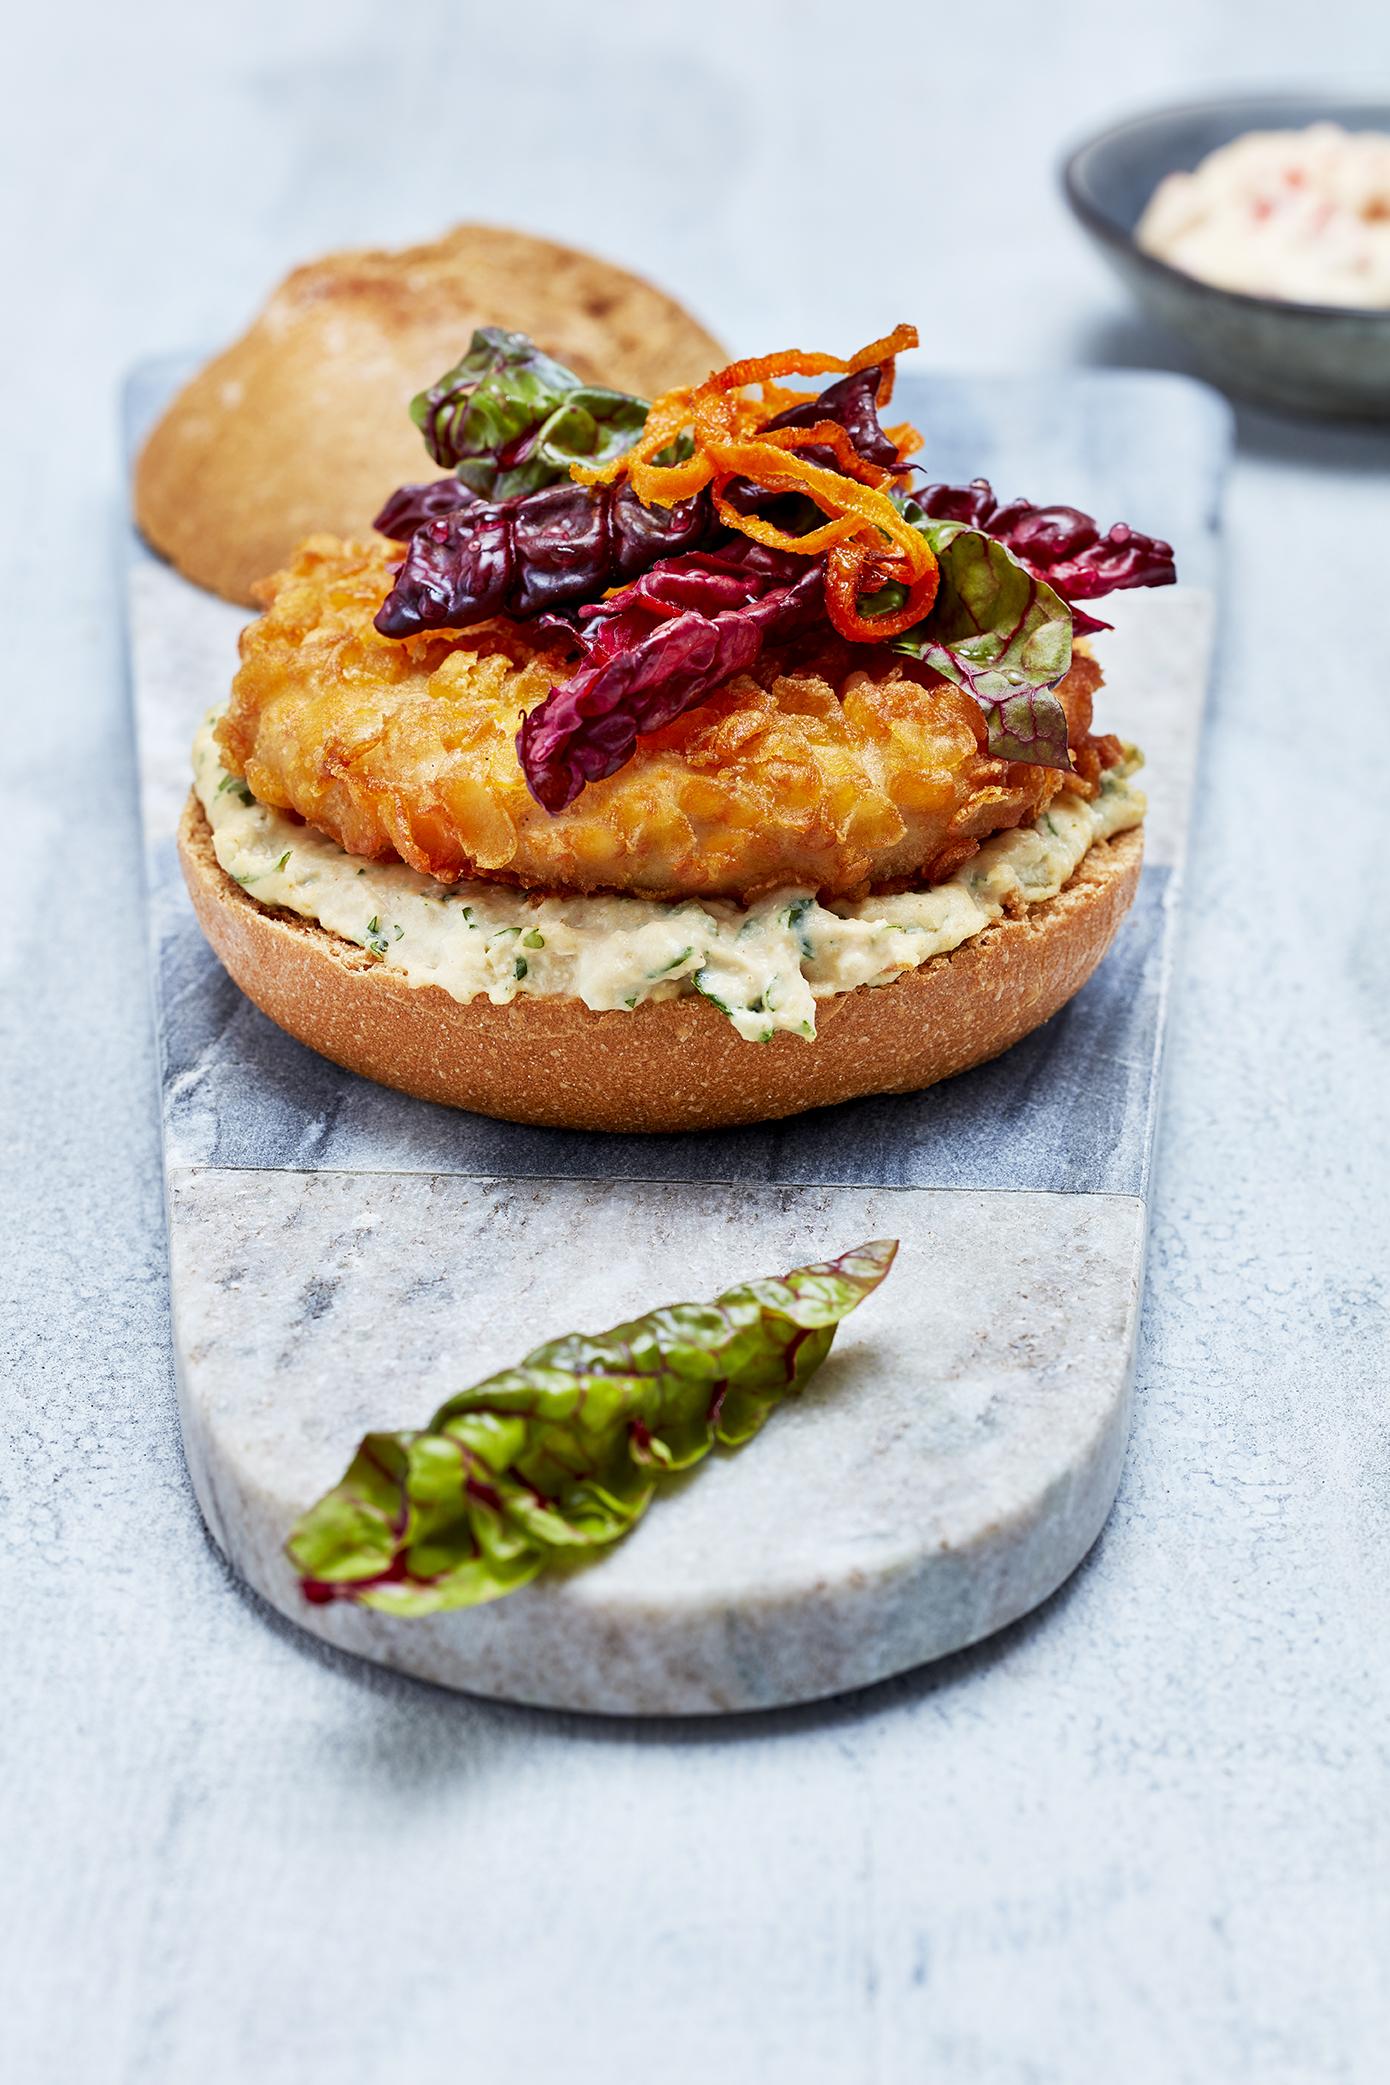 OSI_Foodworks_ChickenBurger_Cornflakes